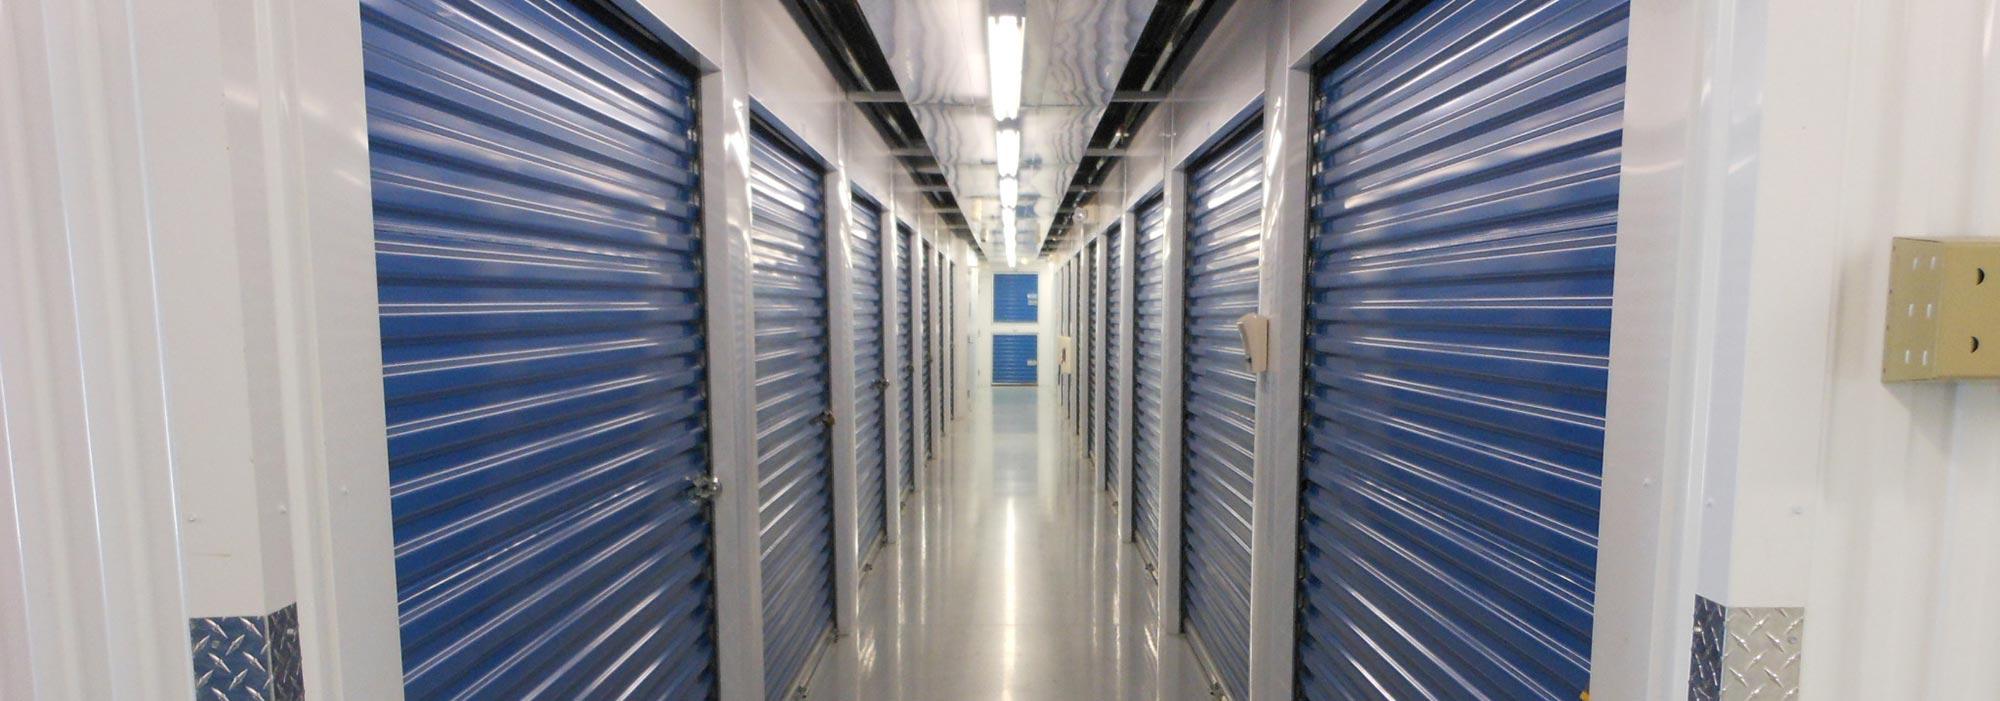 Self storage in Sewickley PA